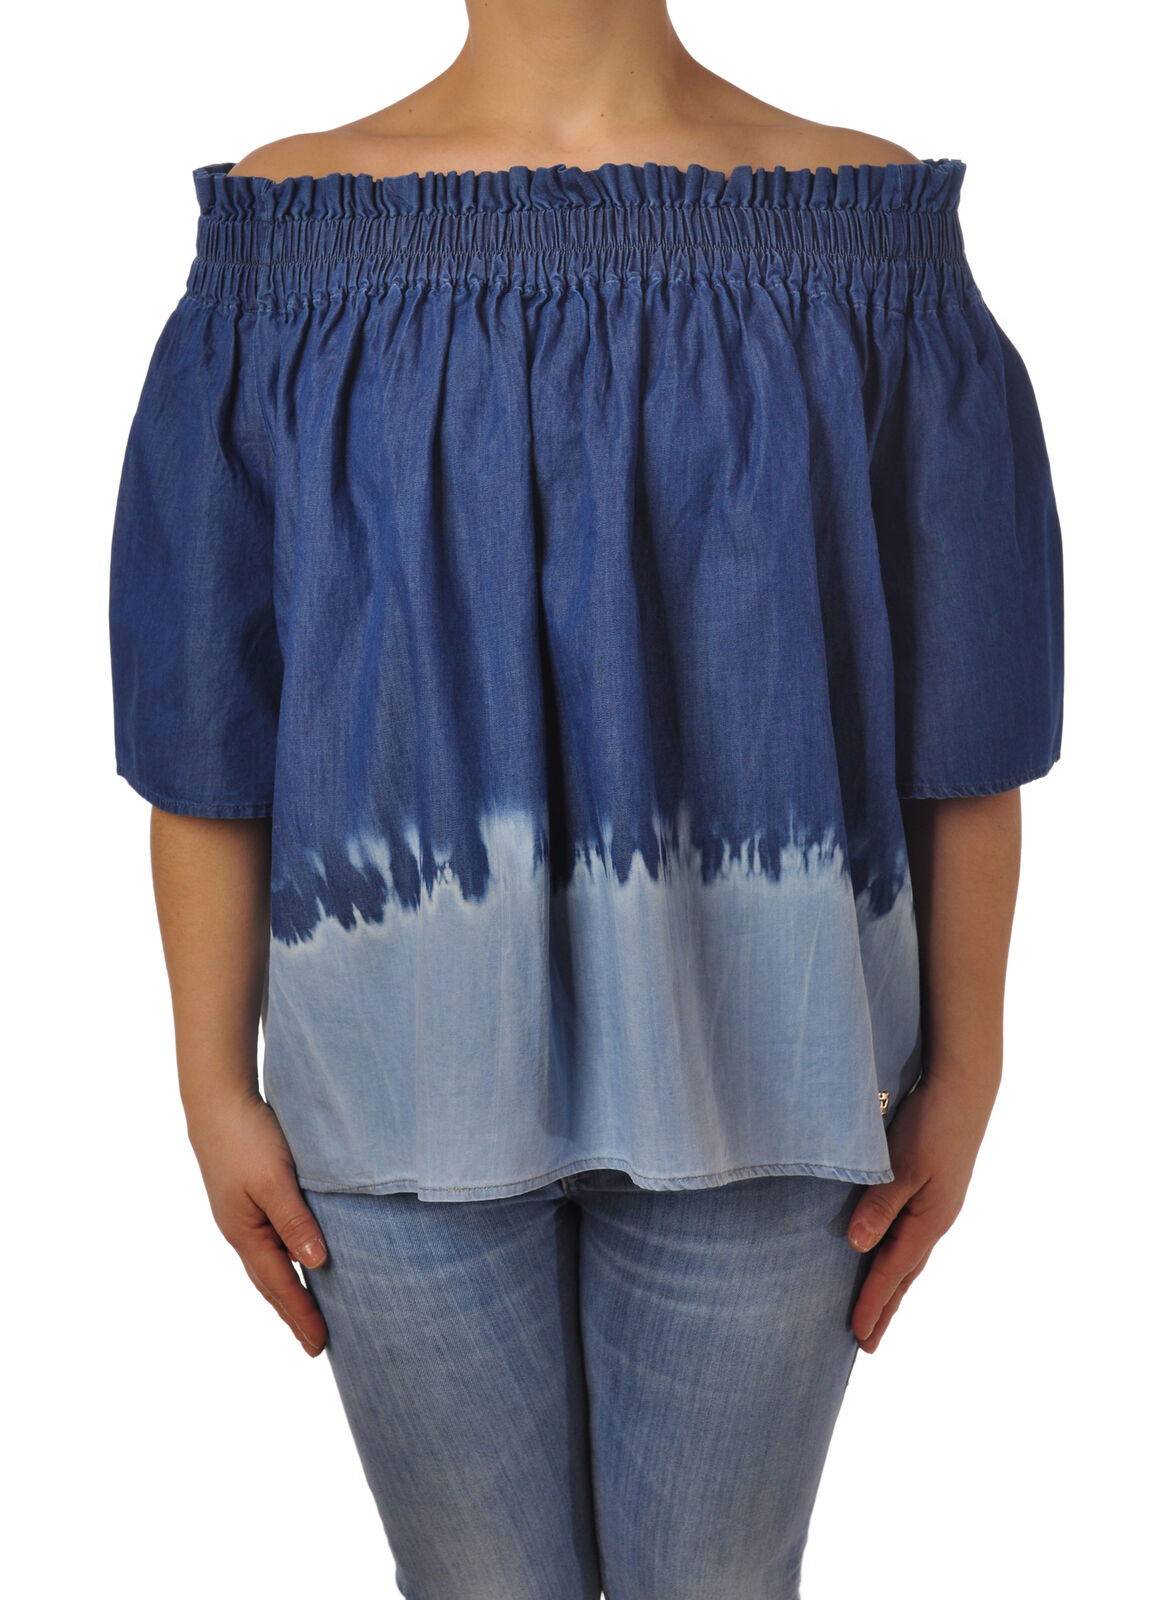 Twin Set - Blausen-Shirt - Frau - Denim - 5096410H185918